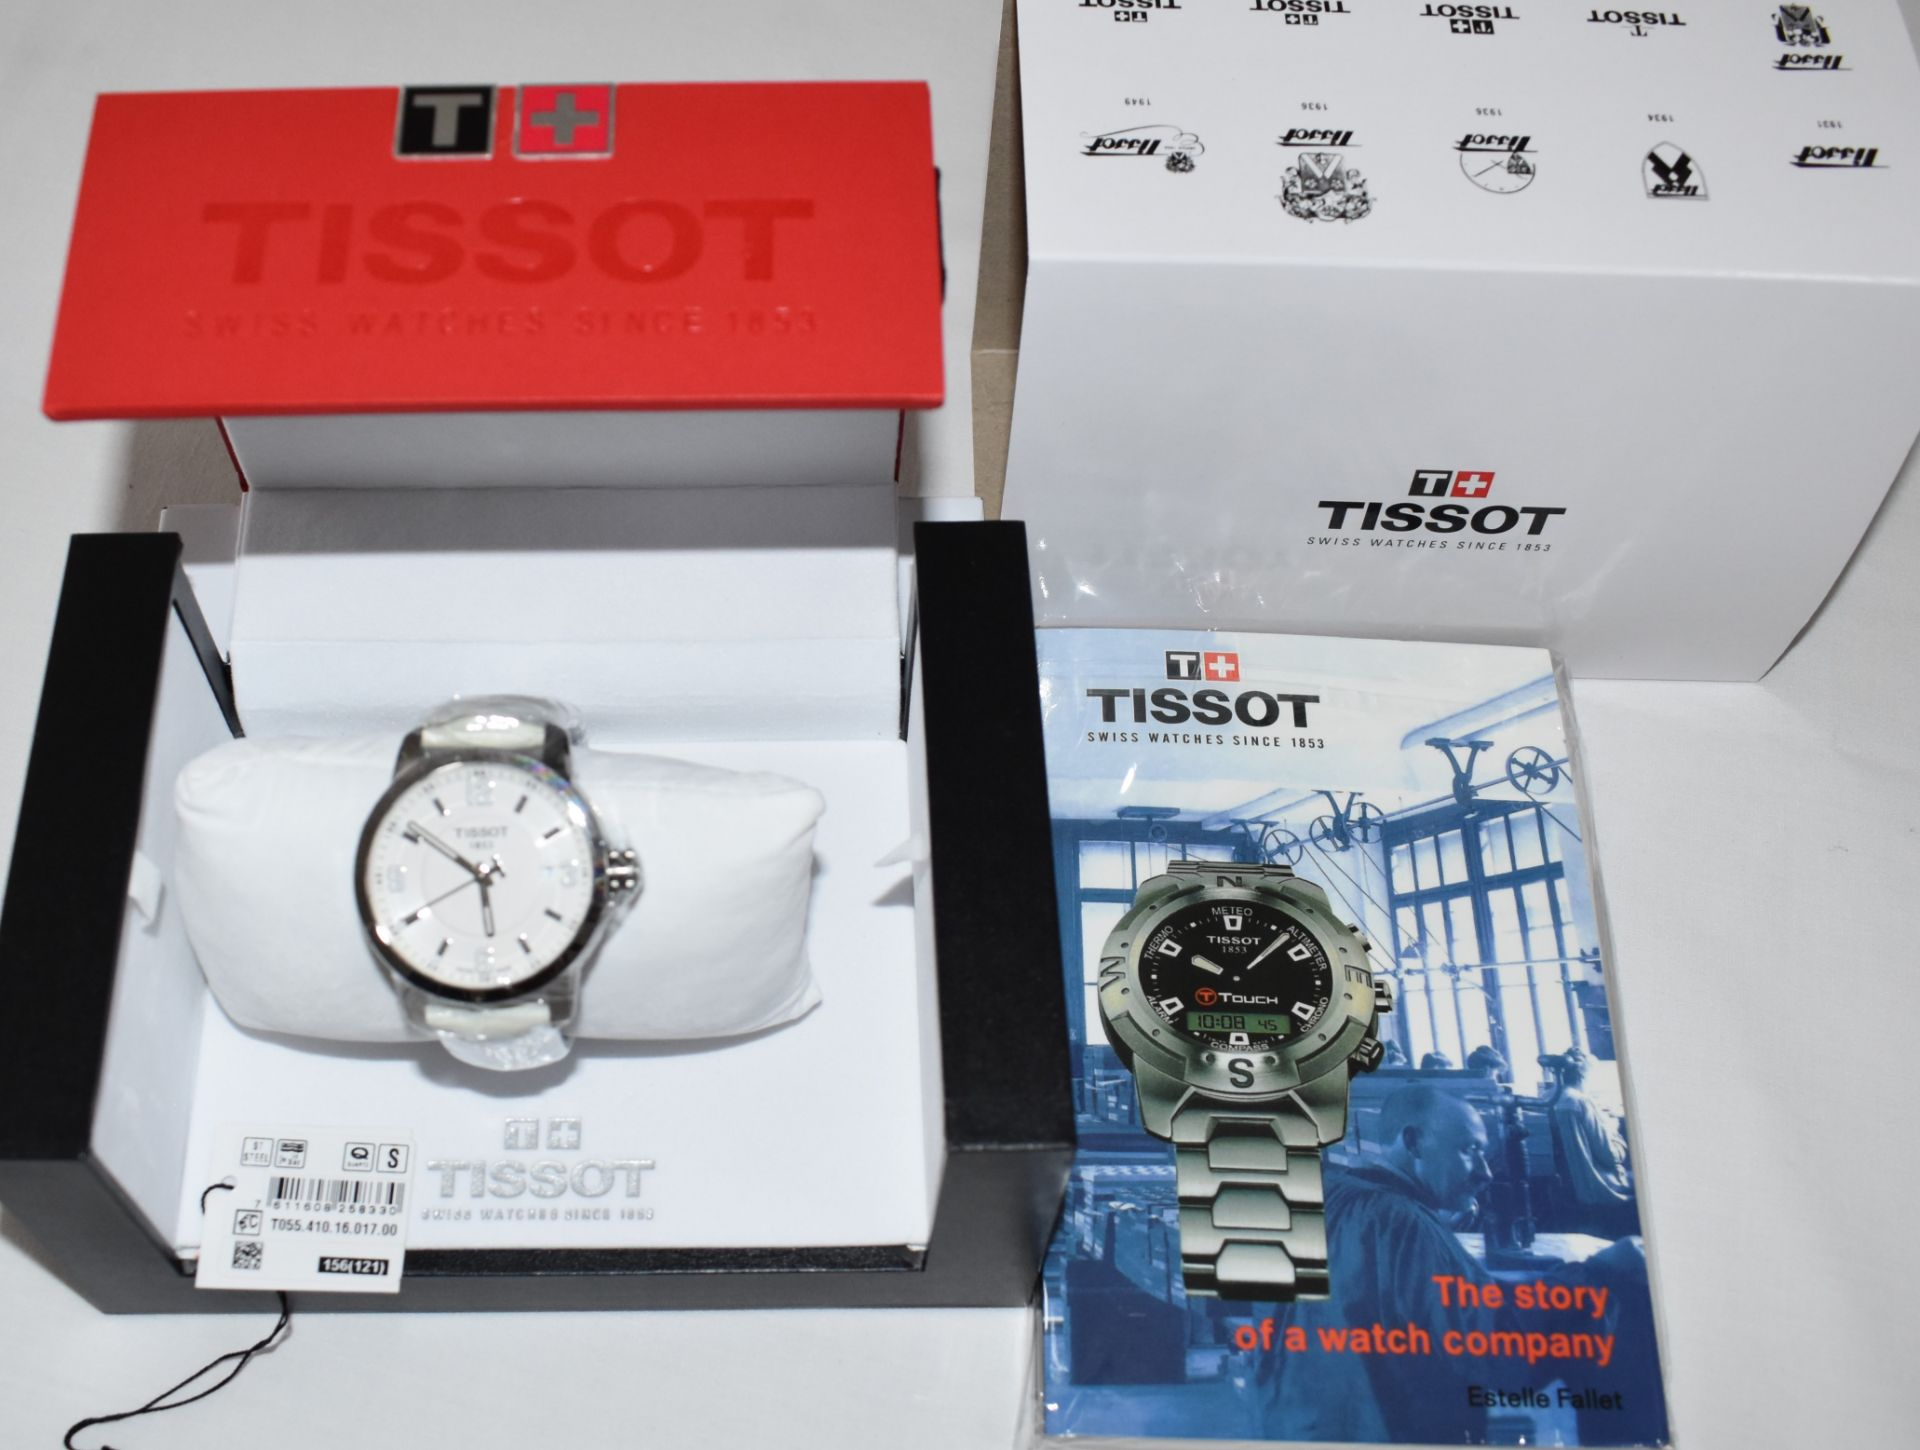 Tissot Men's Watch TO55.410.16.017.00 - Image 3 of 3